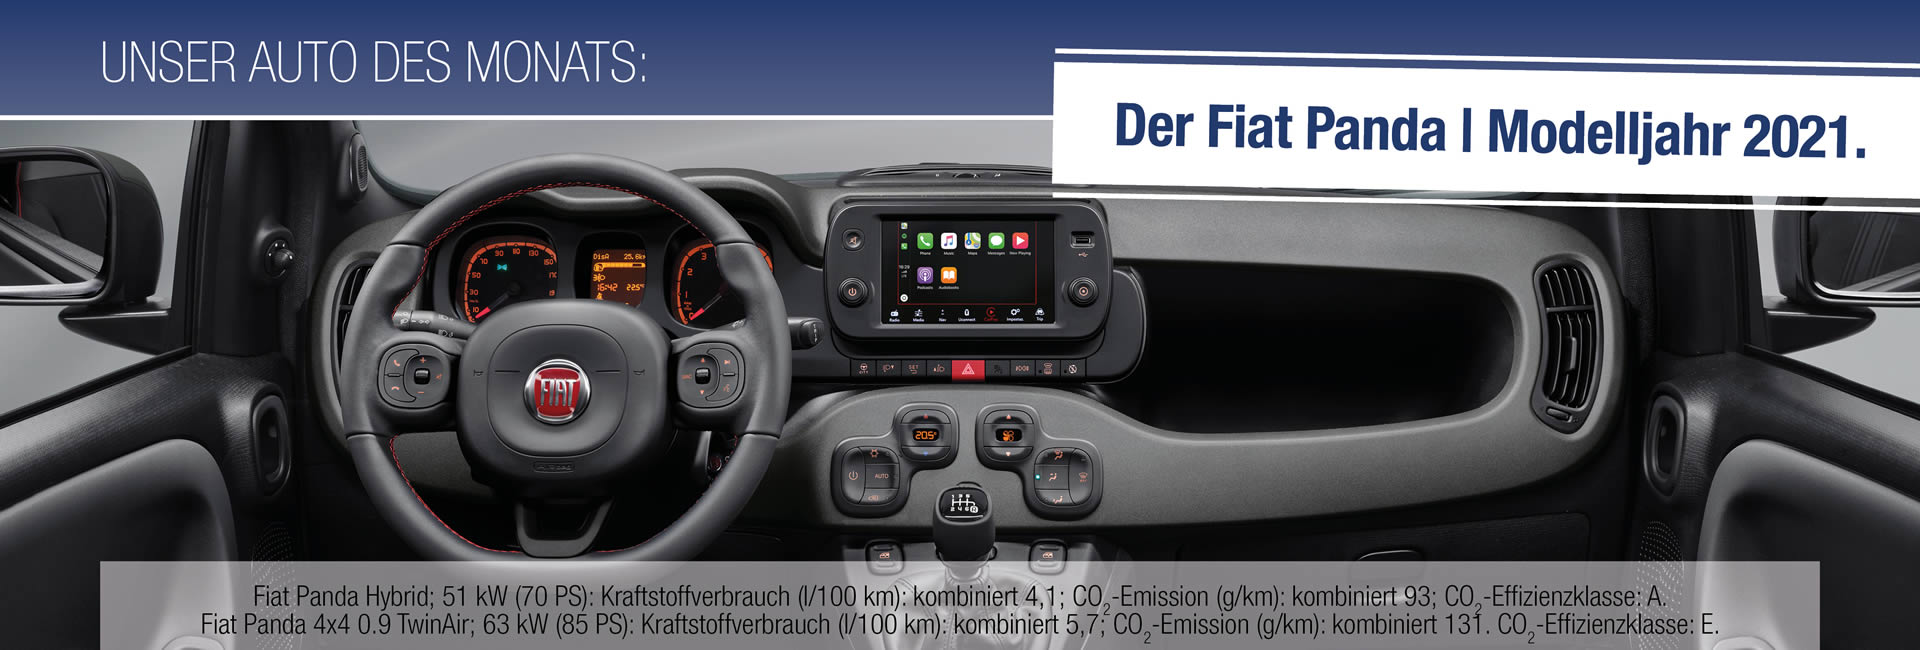 Auto des Monats 11-2020 Fiat Panda – Slider